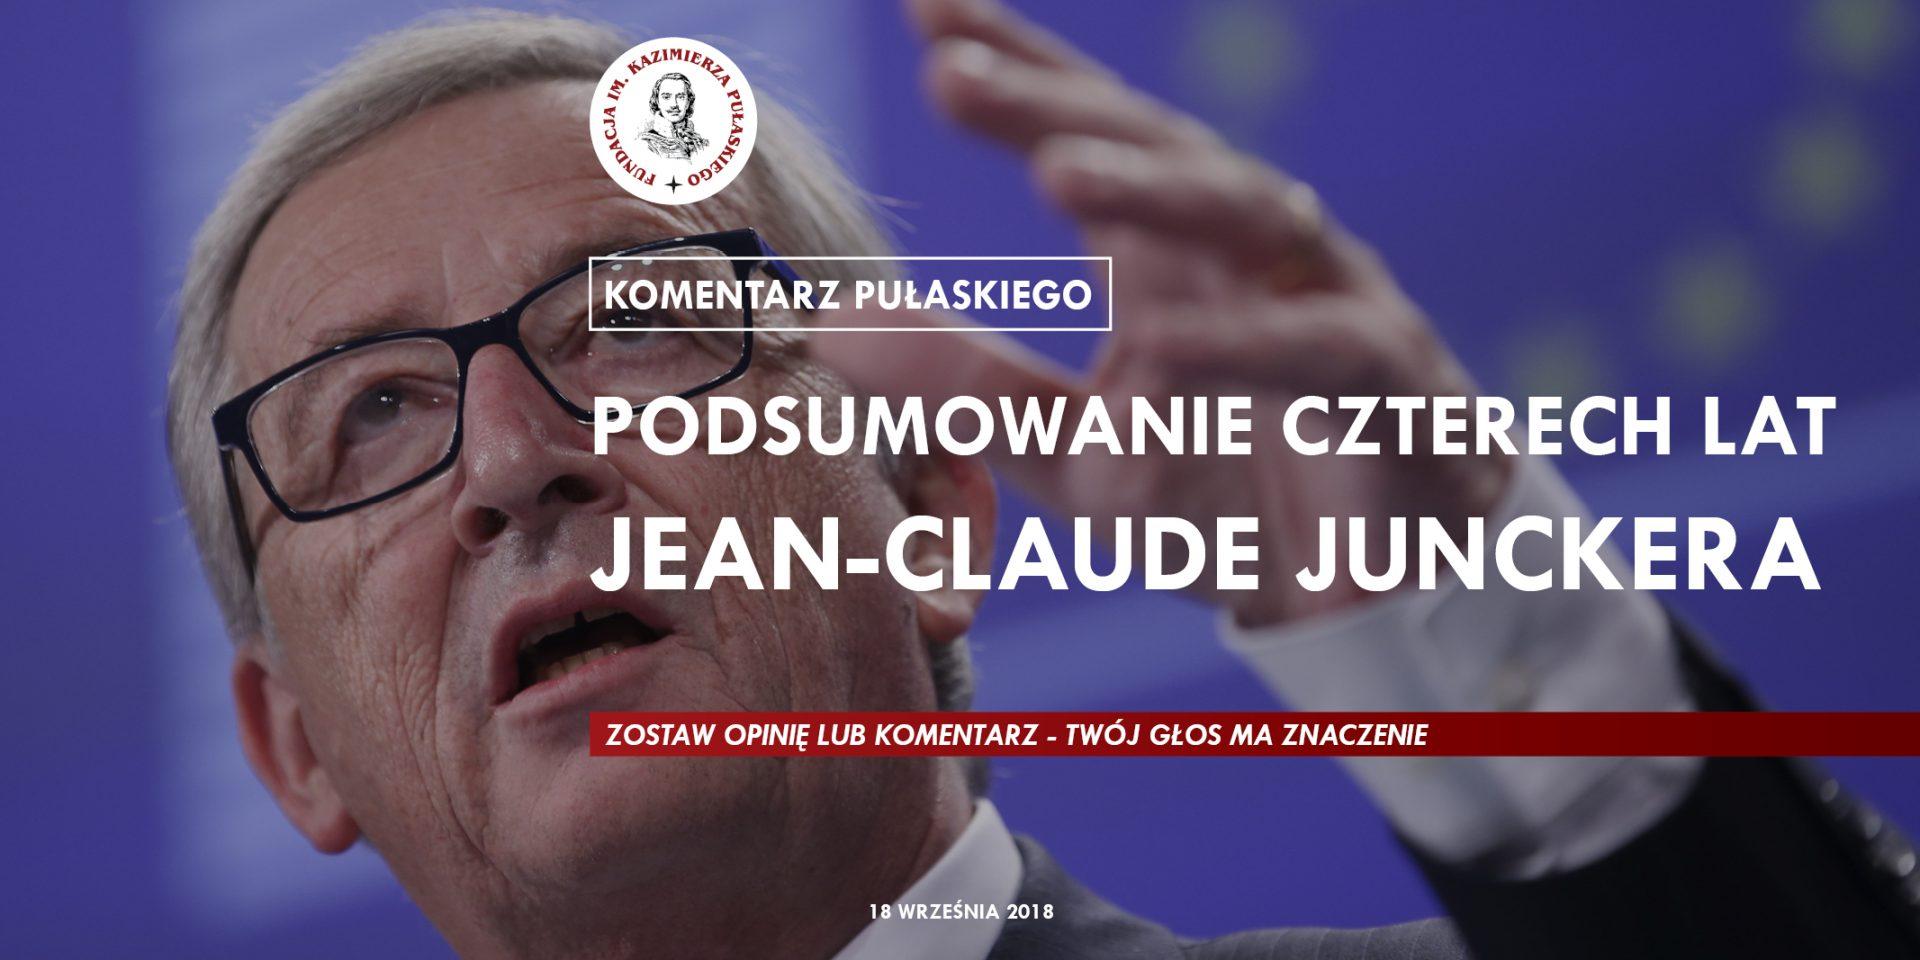 KOMENTARZ PUŁASKIEGO – P.Chomicka: Podsumowanie czterech lat Jean-Claude Junckera